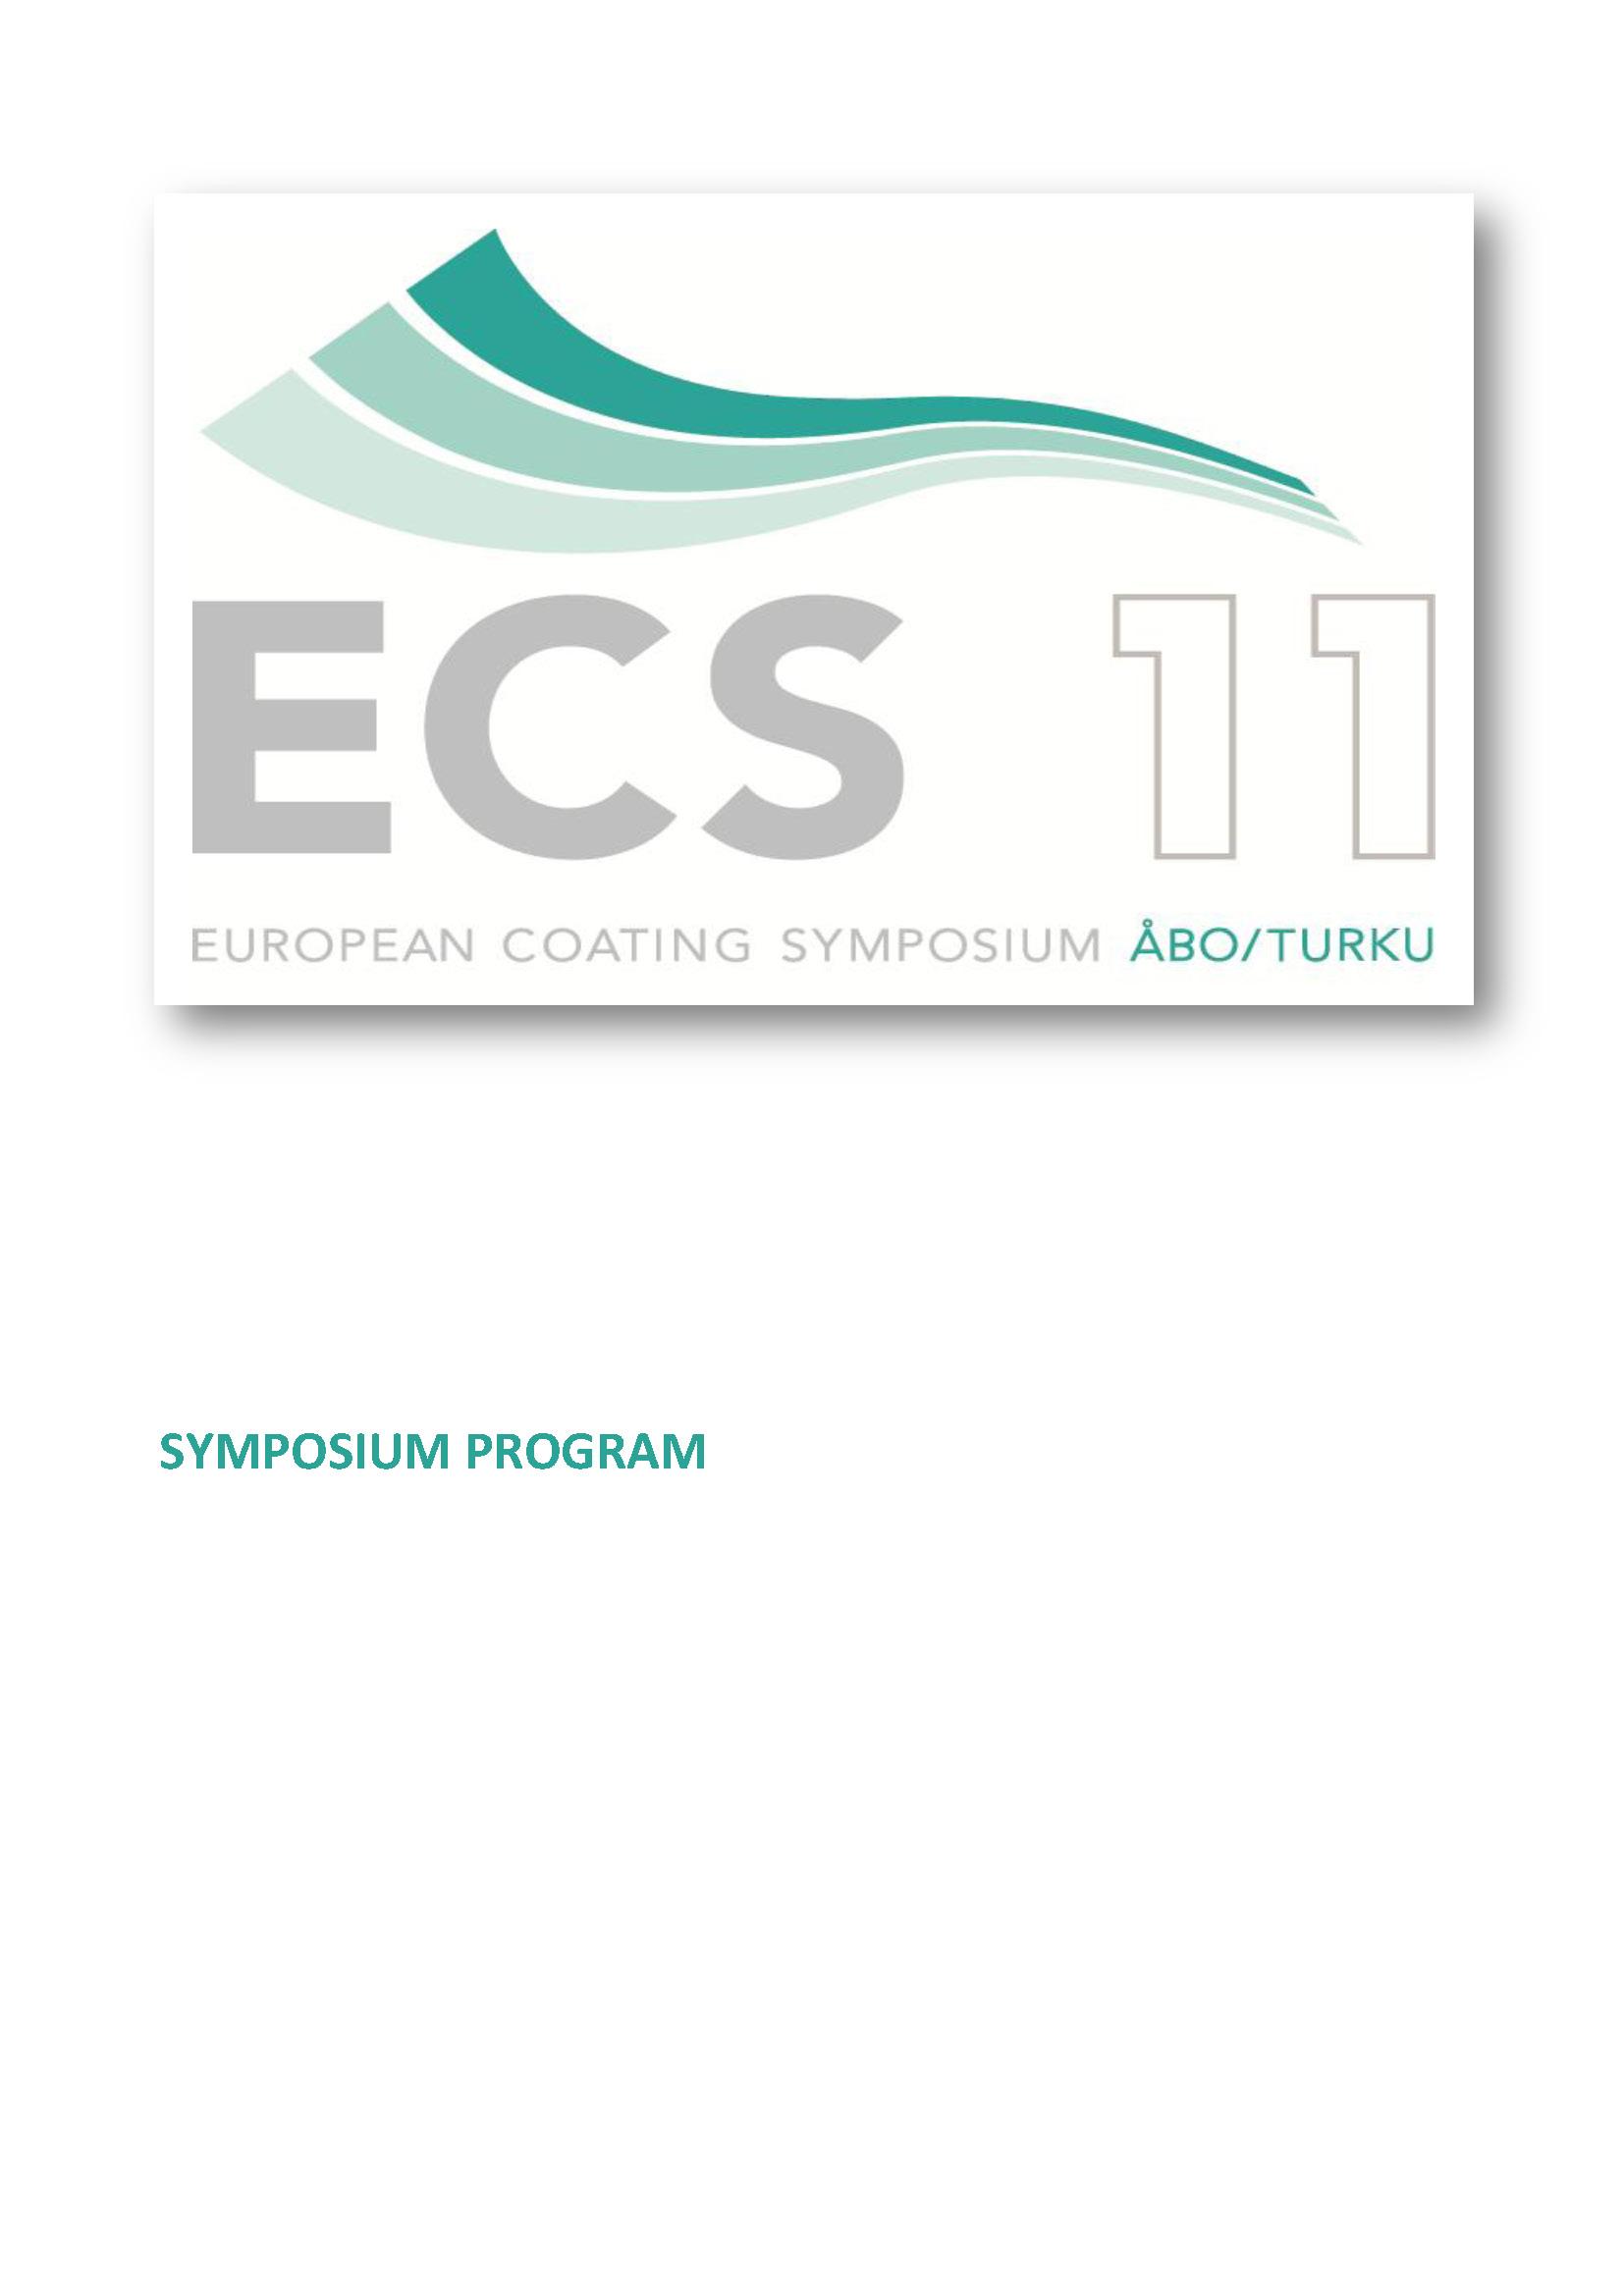 Ecs 2011 European Coating Symposium Click The Picture To Enlarge Image